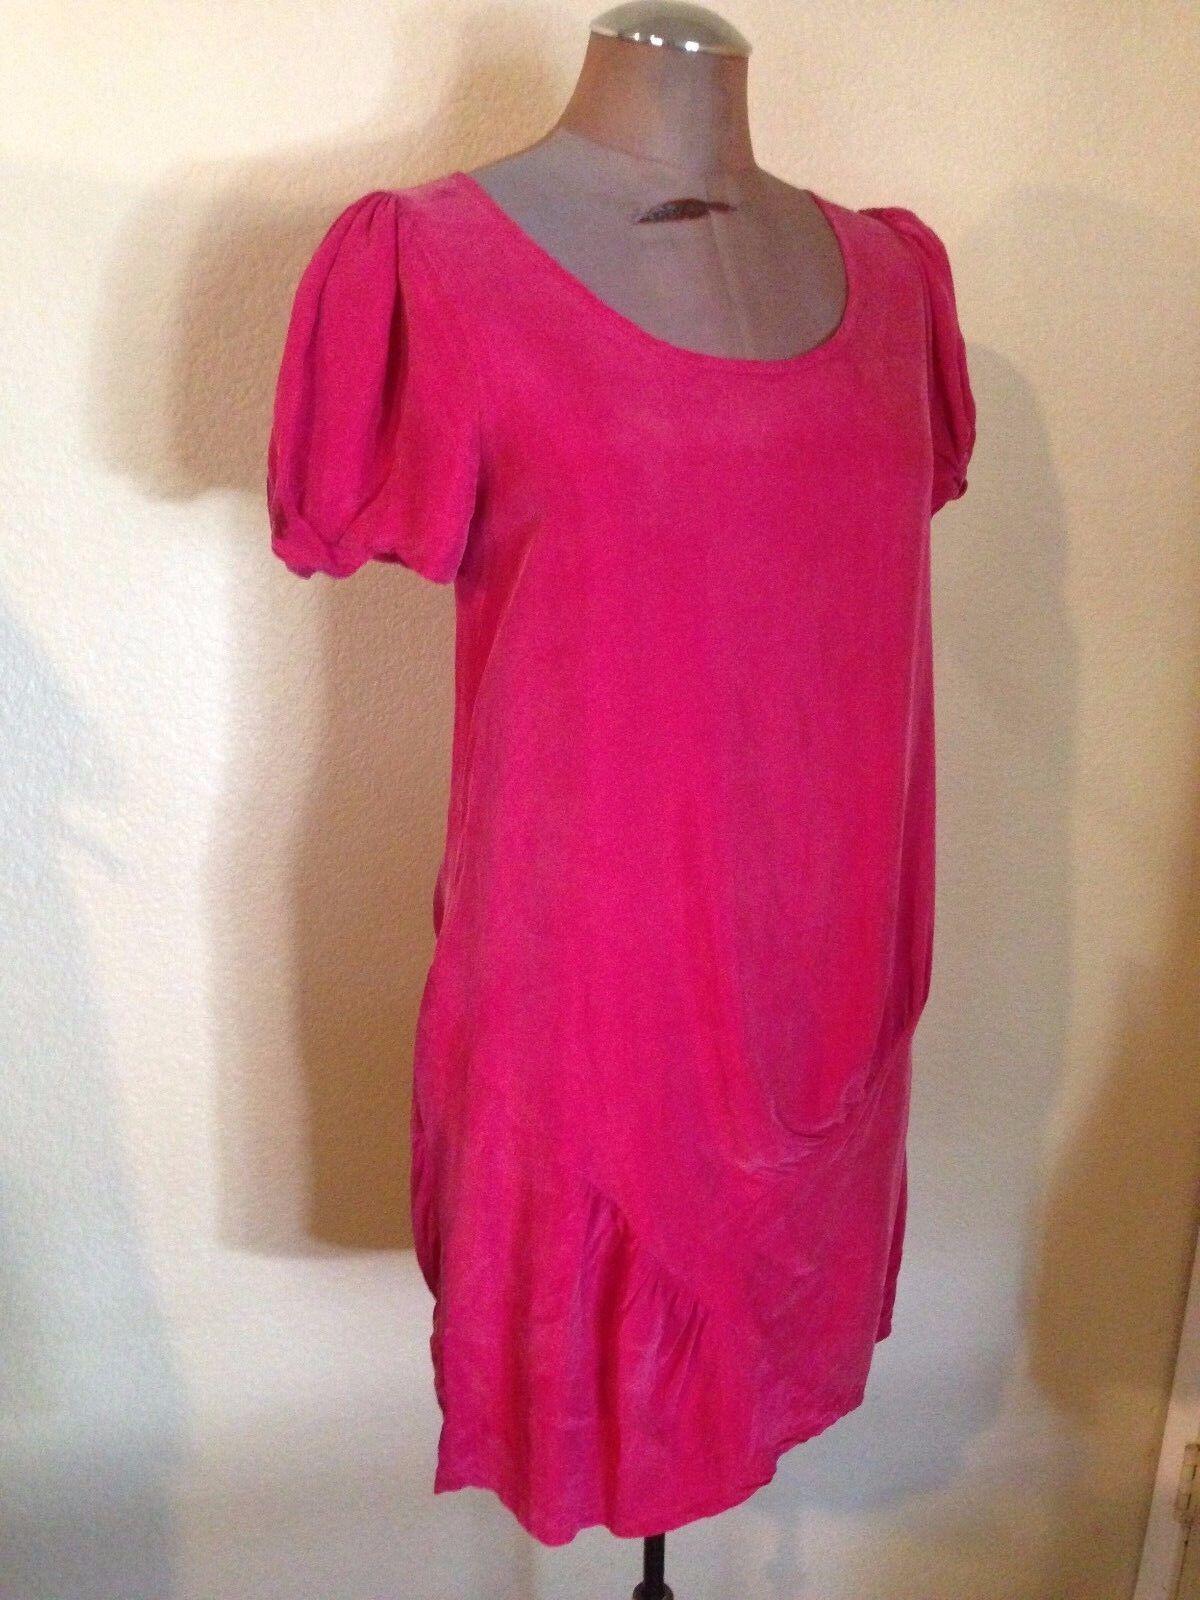 MARNI 100% Silk Dress Straight Shift Short Puff Sleeves Knee Length Pink Size XS